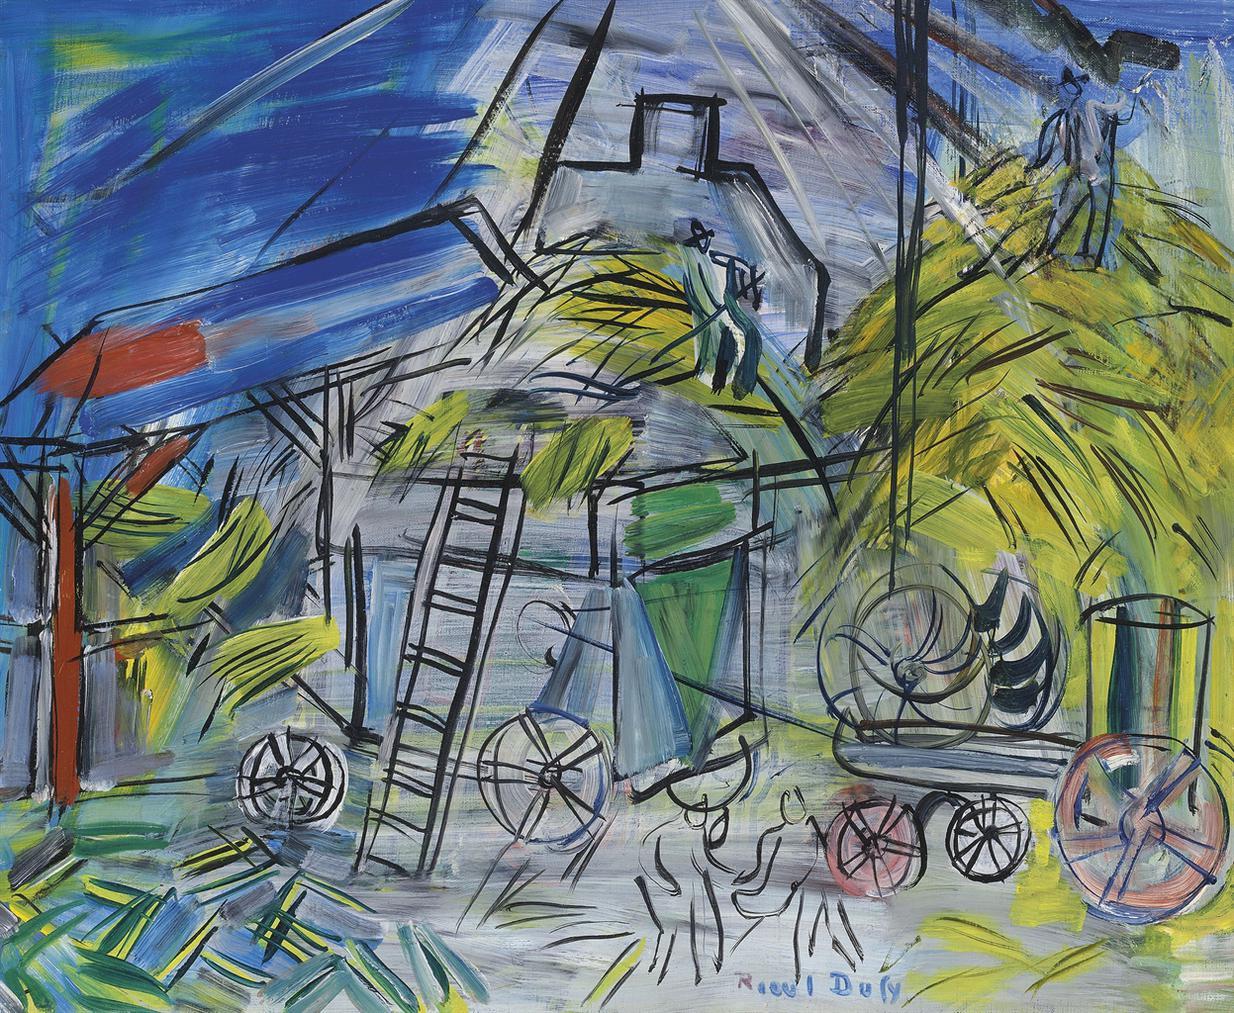 Raoul Dufy-Depiquage Au Ciel Orageux-1946